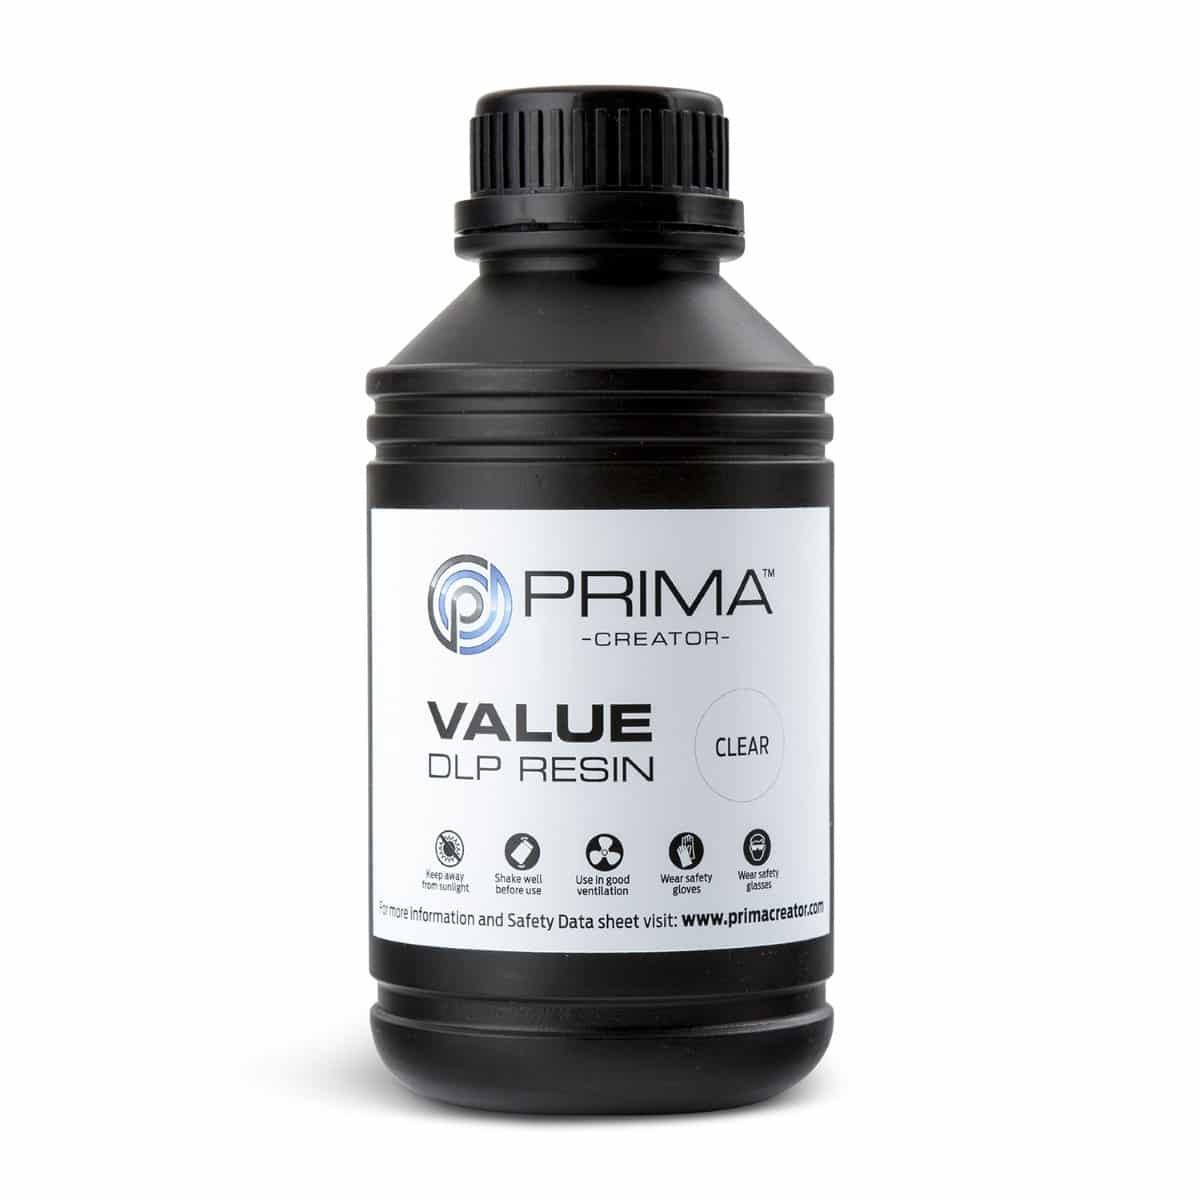 Image of PrimaCreator Value UV / DLP Resin - 500 ml - Clear